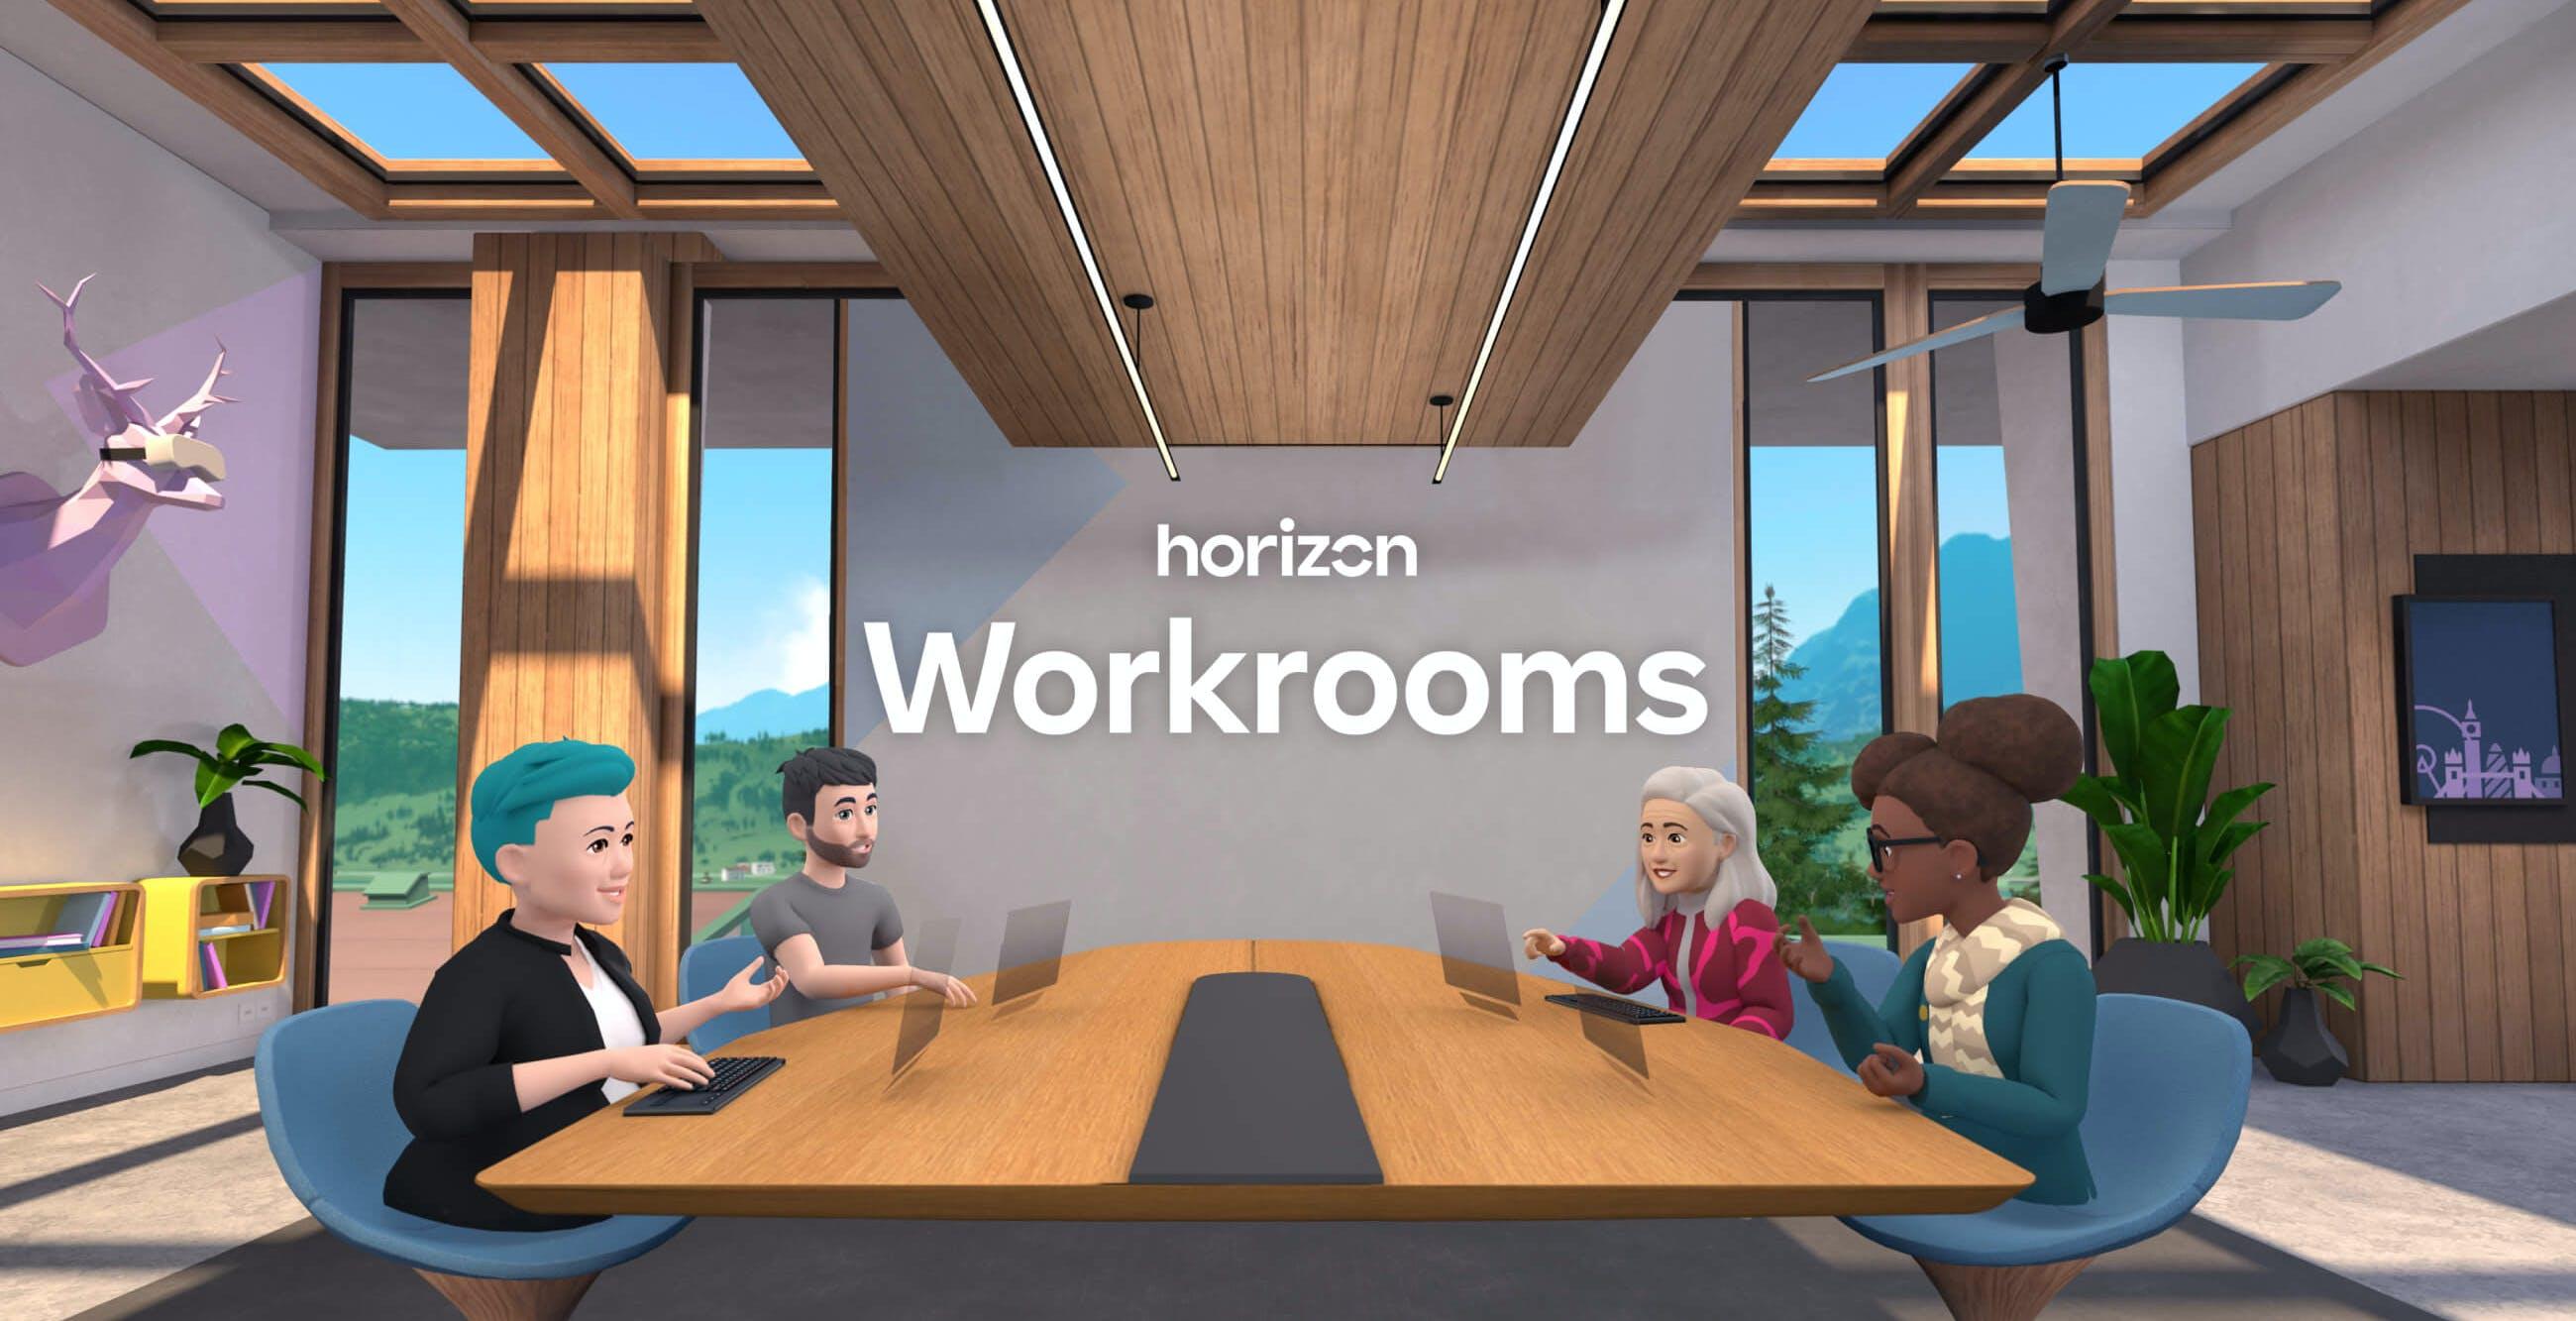 Facebook ha inventato le riunioni virtuali in 3D tramite Oculus Quest 2